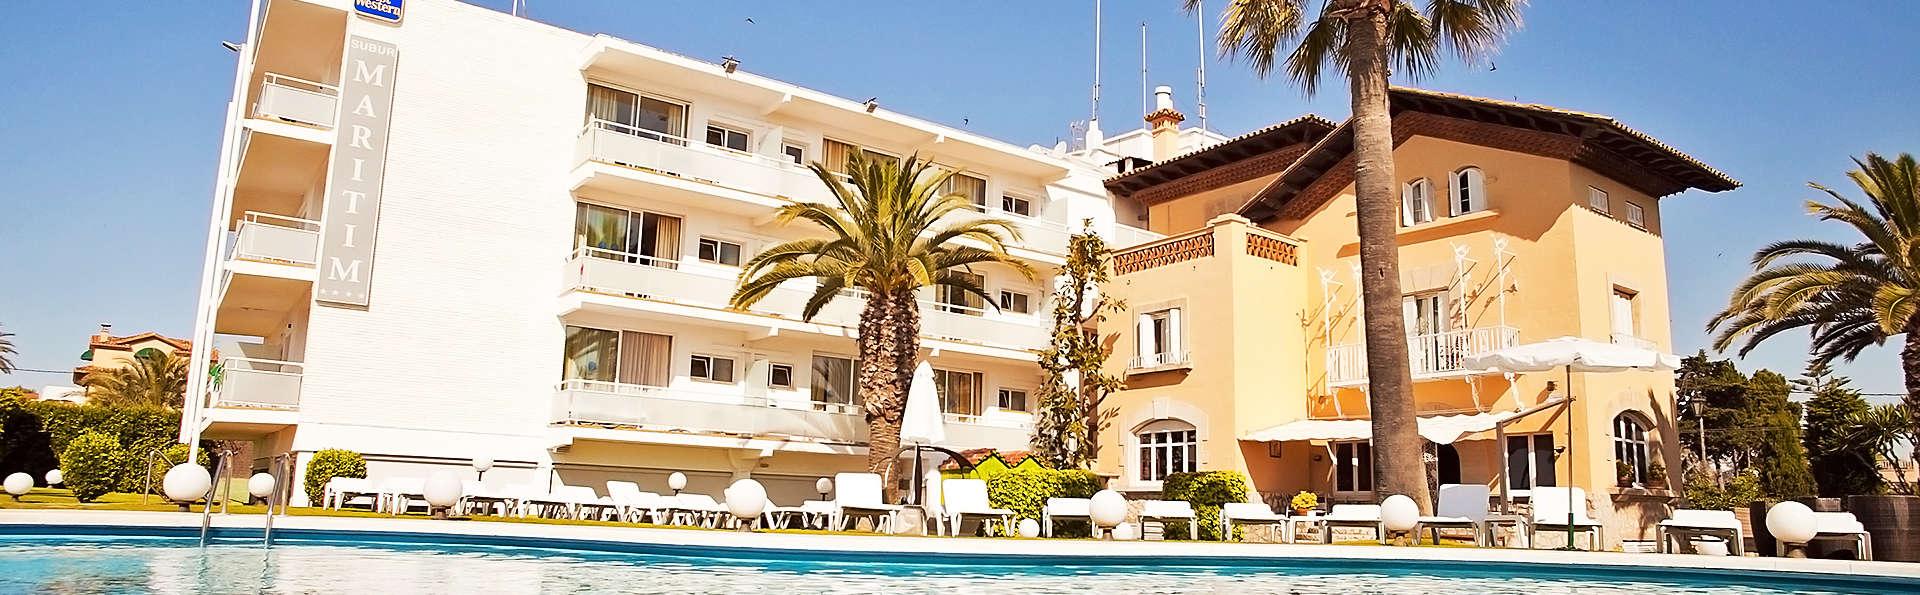 Hotel Subur Maritim - EDIT_1_PRINCIPAL.jpg